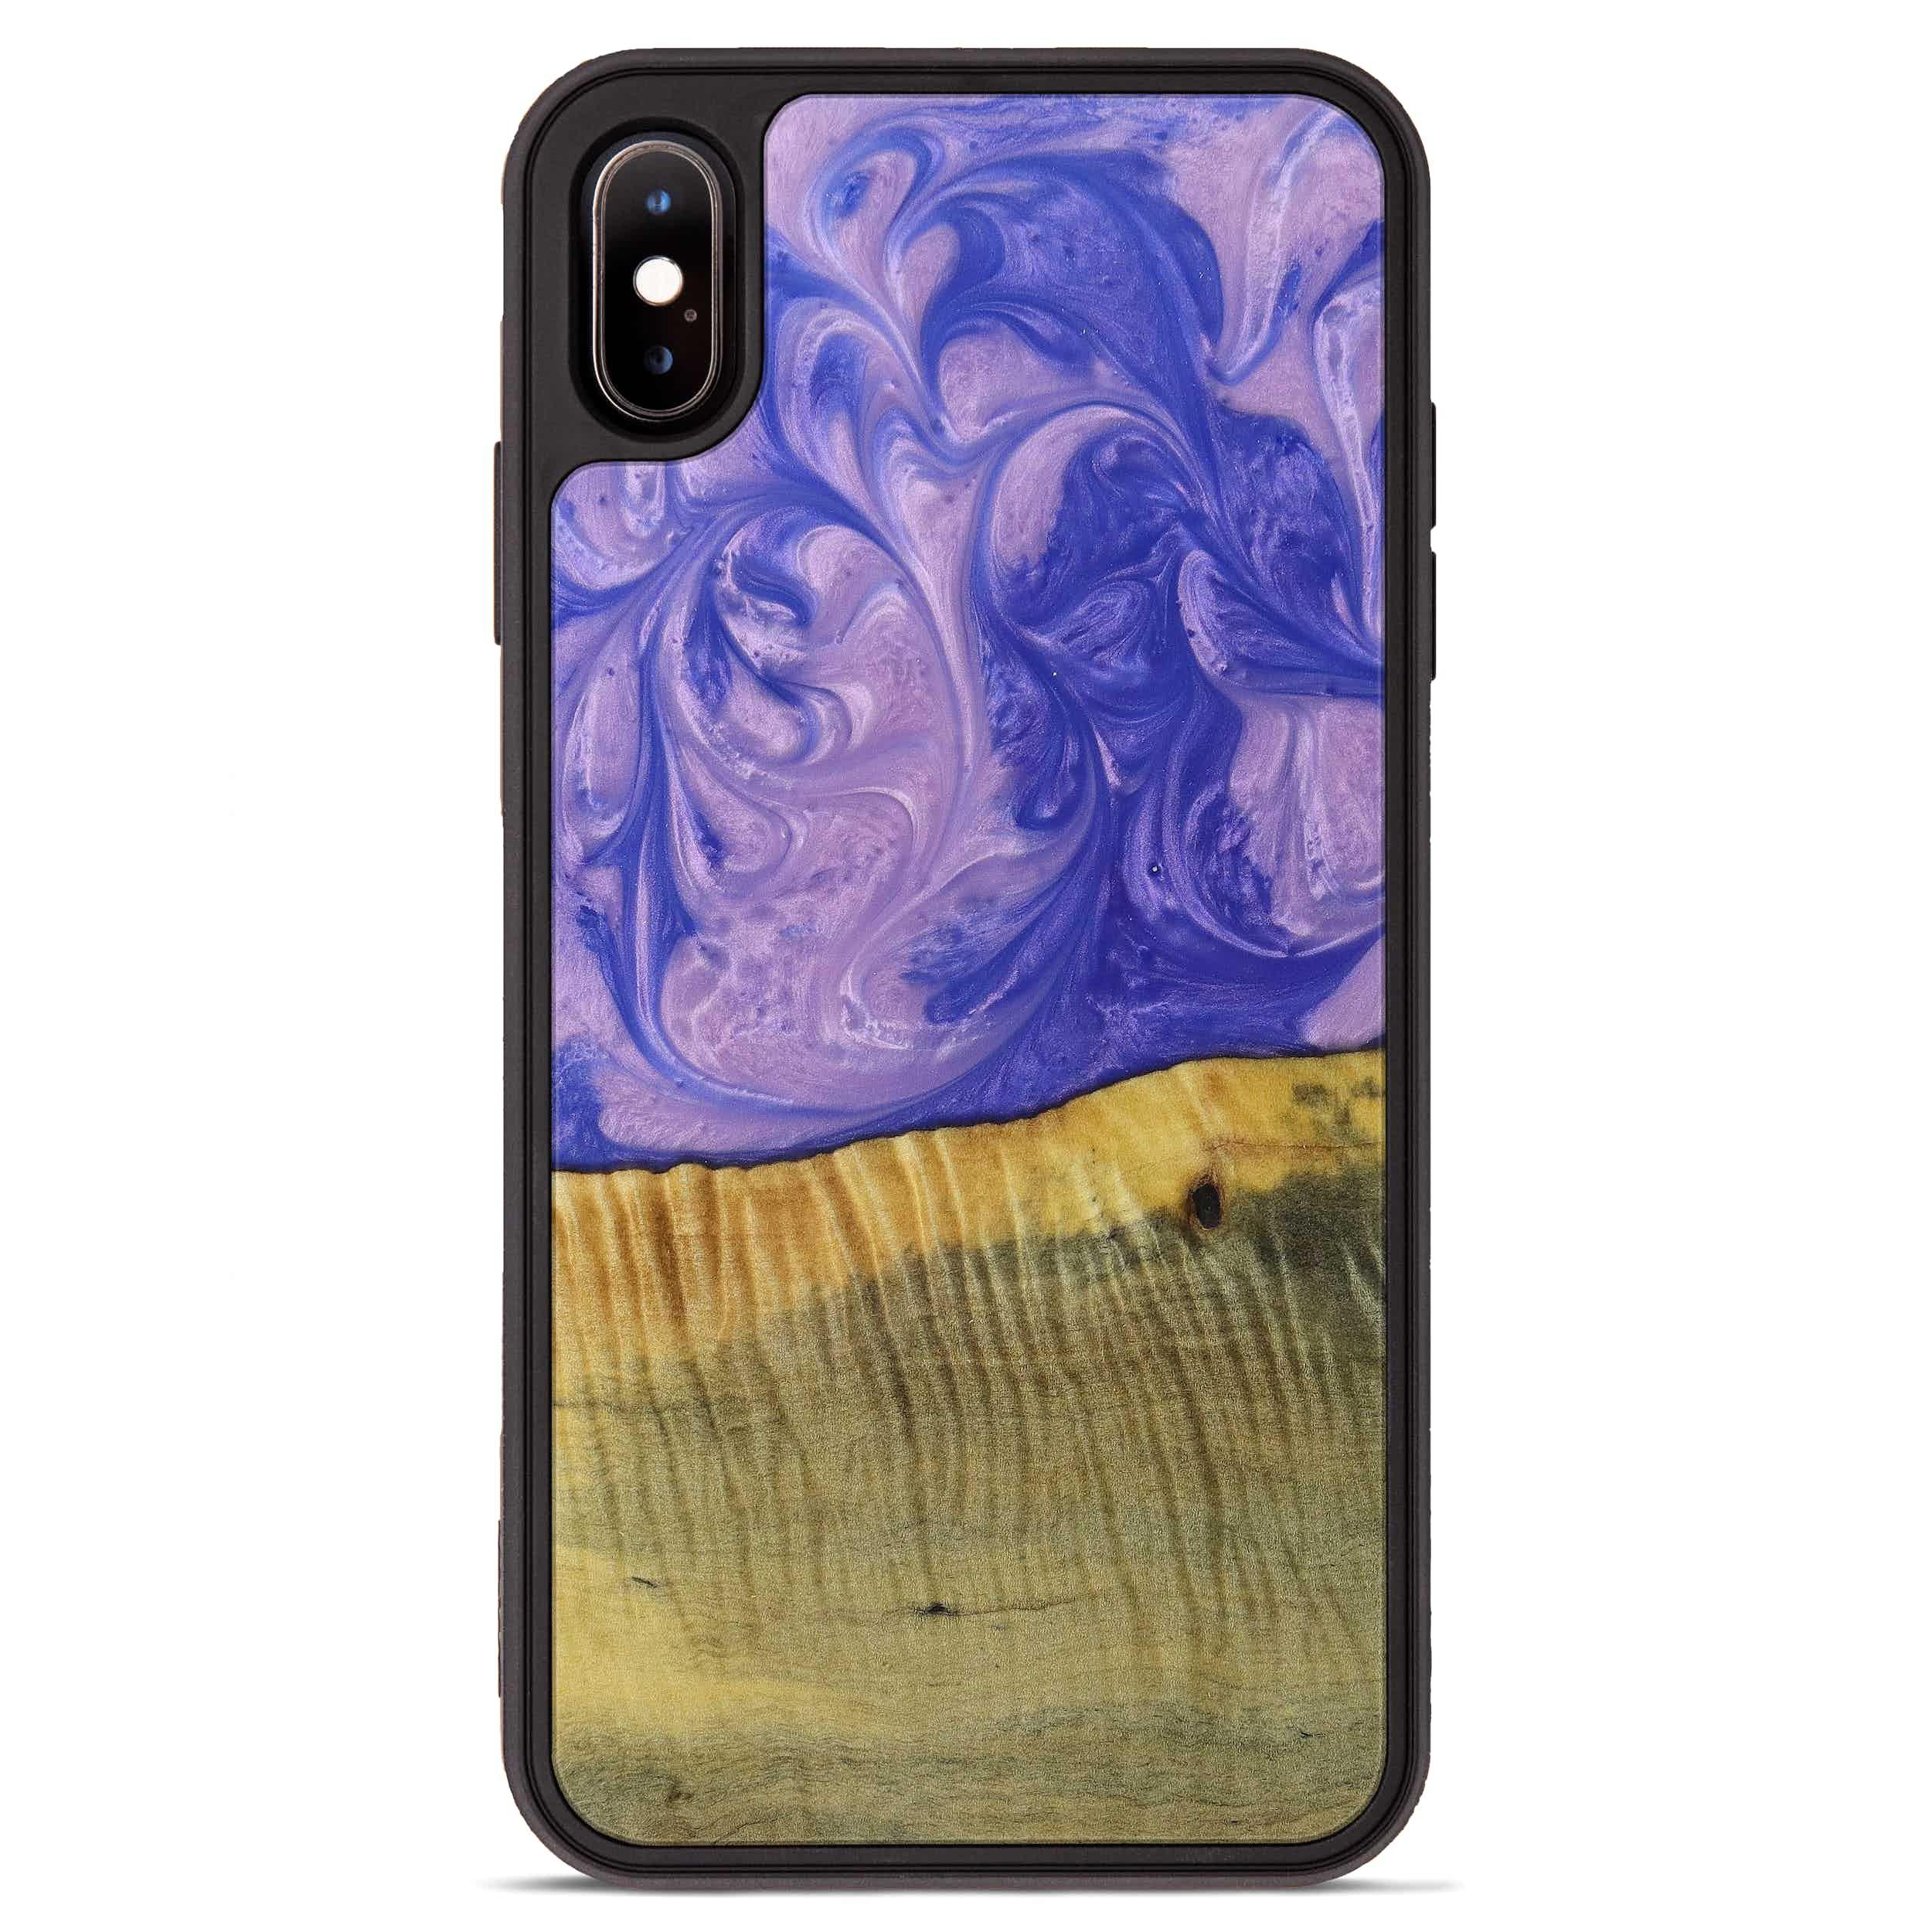 iPhone Xs Max Wood+Resin Phone Case - Samuel (Purple, 395905)